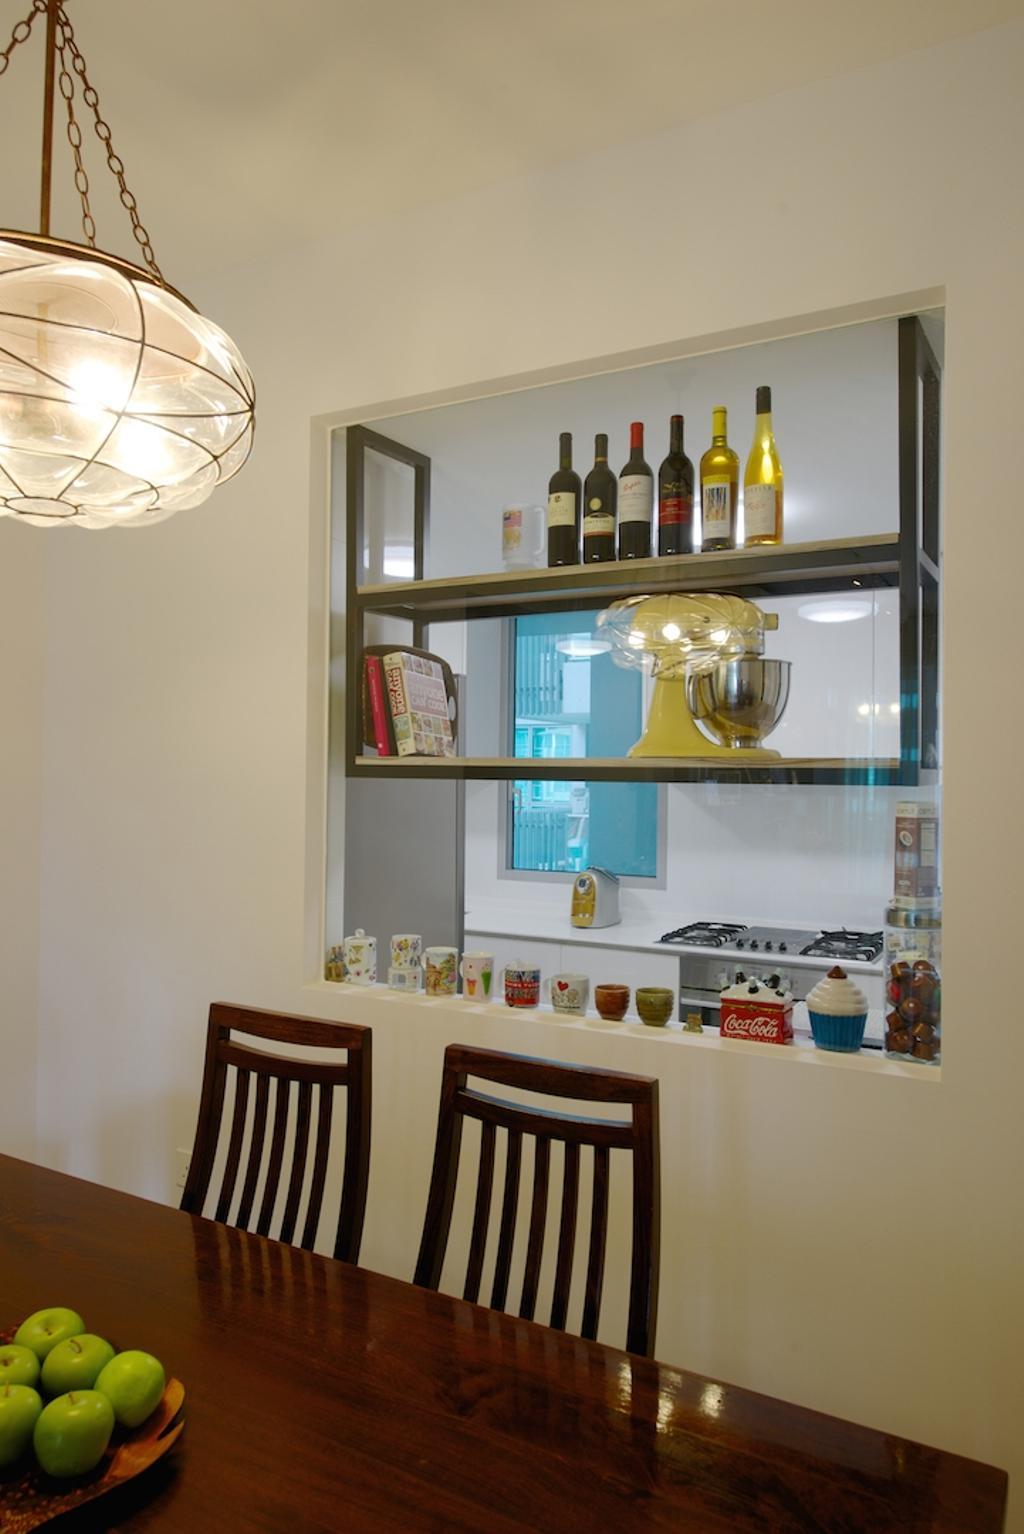 Scandinavian, Condo, Dining Room, Miltonia, Interior Designer, Dyel Design, Hanging Light, Decorative Light, Wooden Chair, Dining Table, Wooden Table, Shelf, Indoors, Interior Design, Room